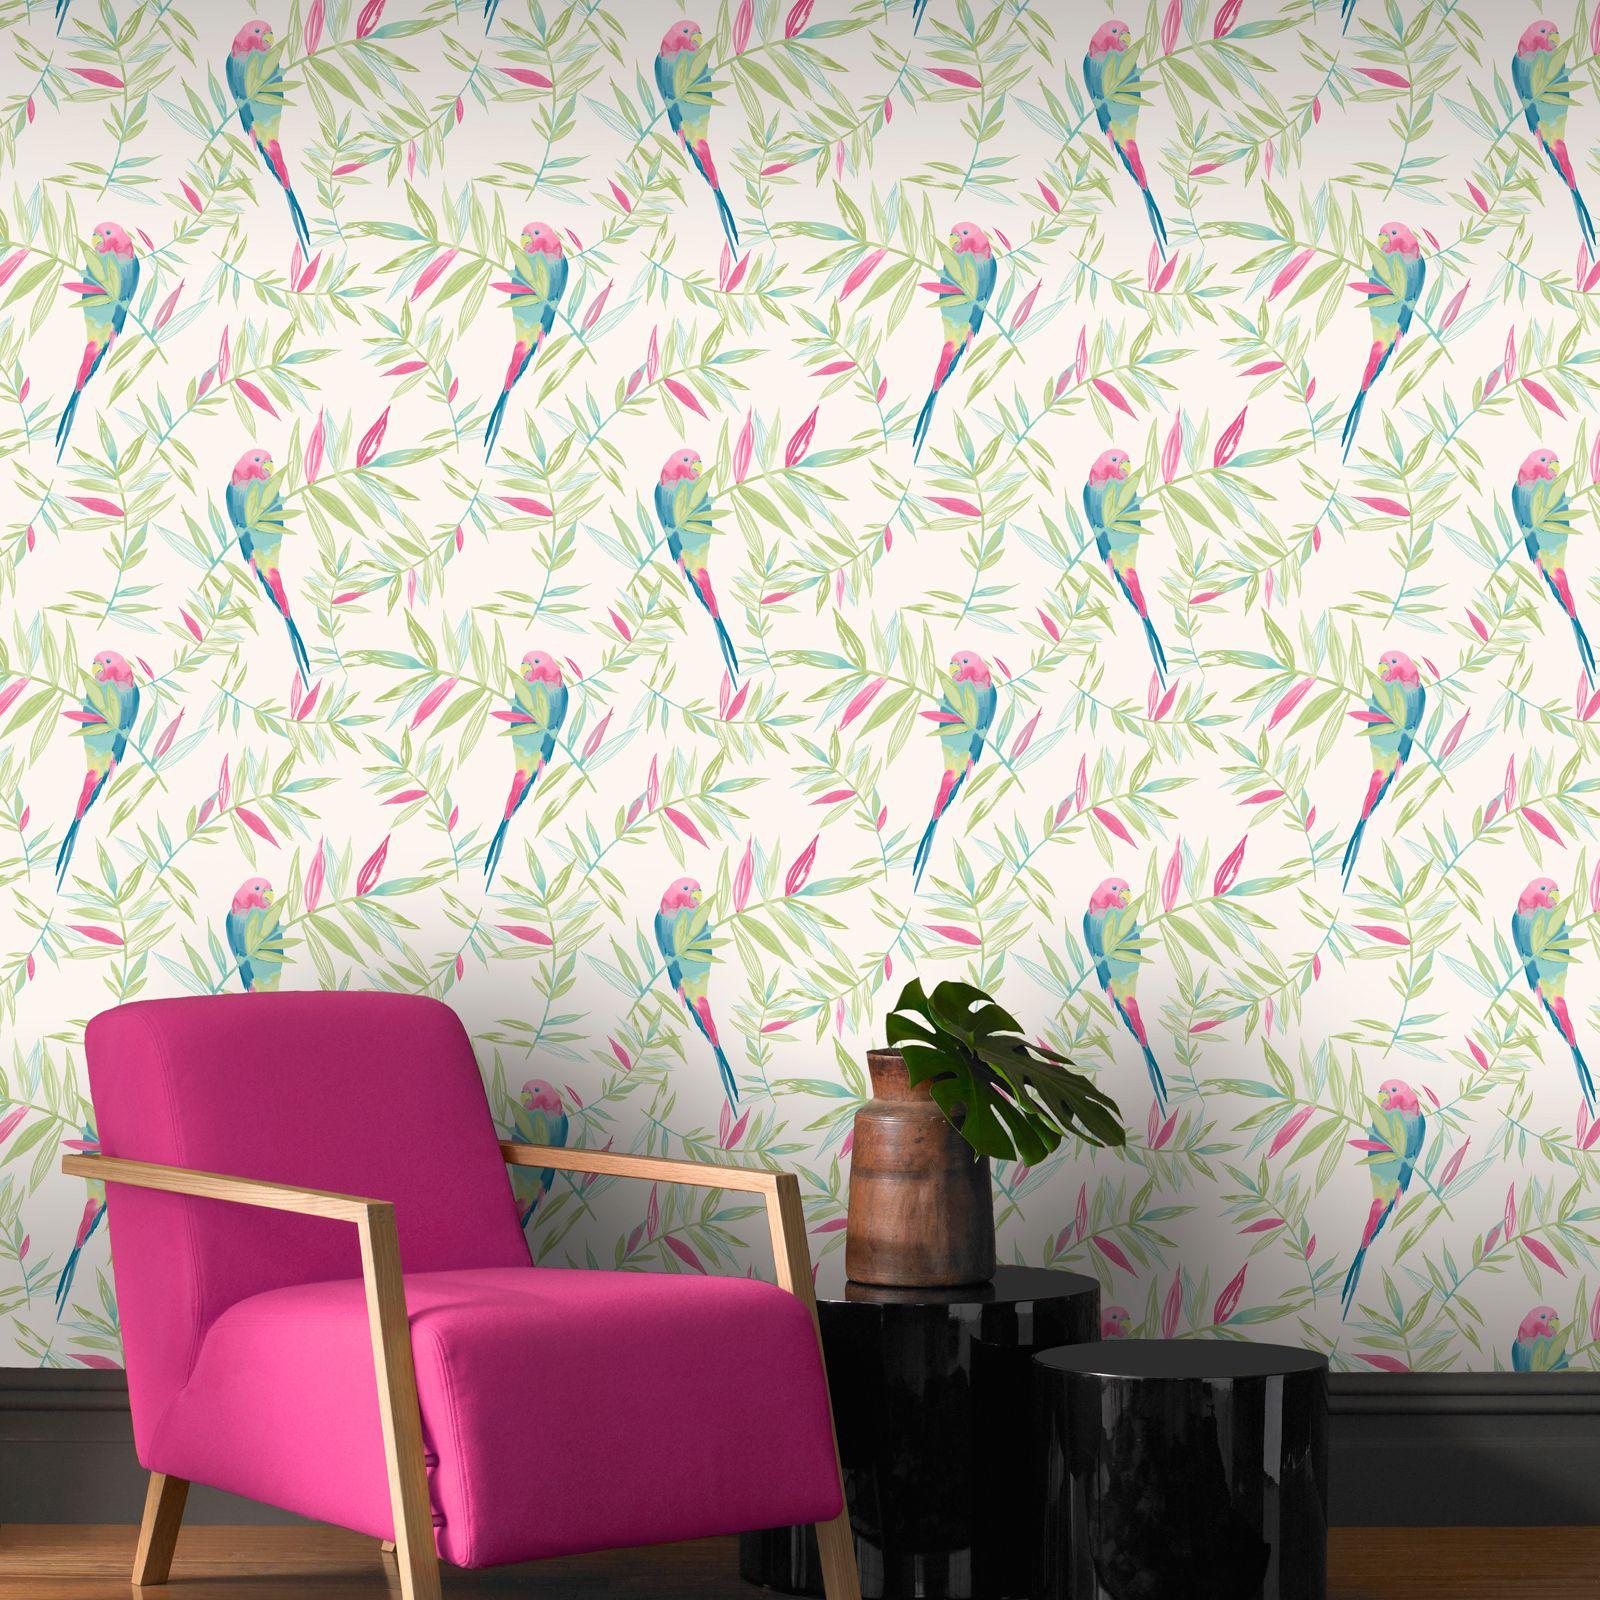 tropical bird wallpaper for walls - photo #35